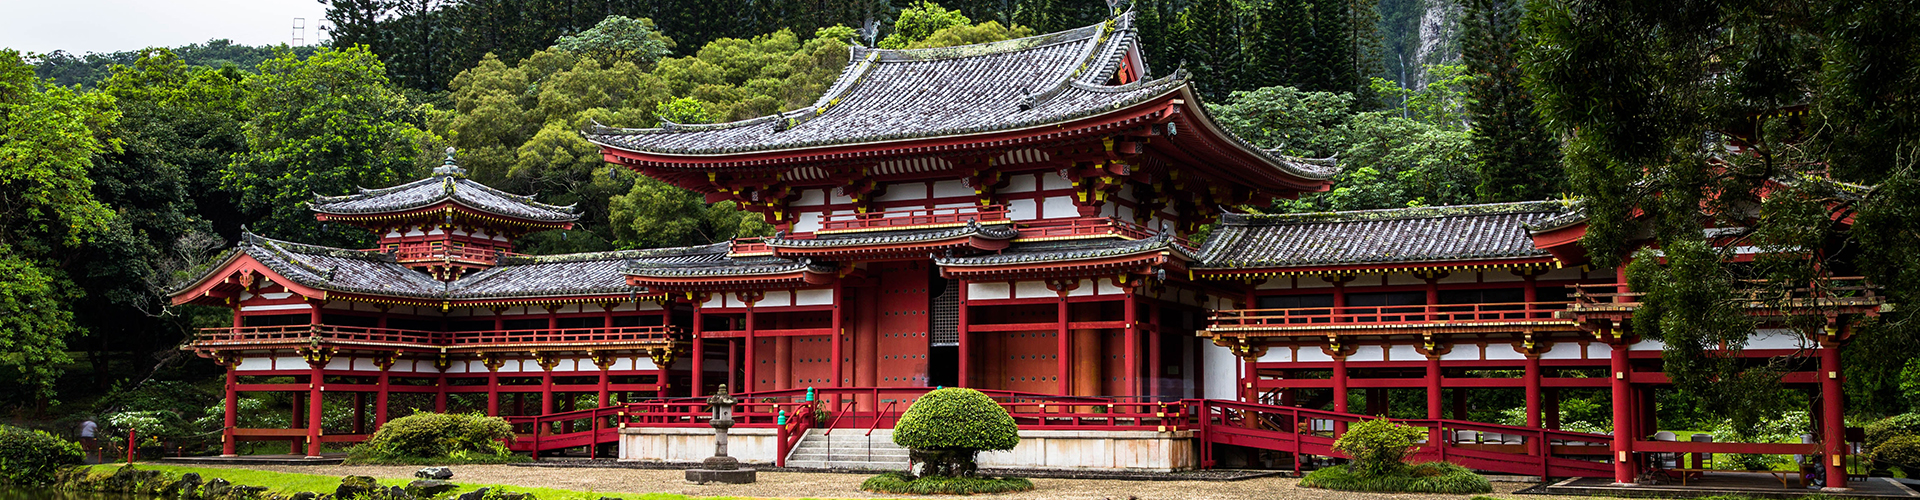 Japanese Gardens W e Love